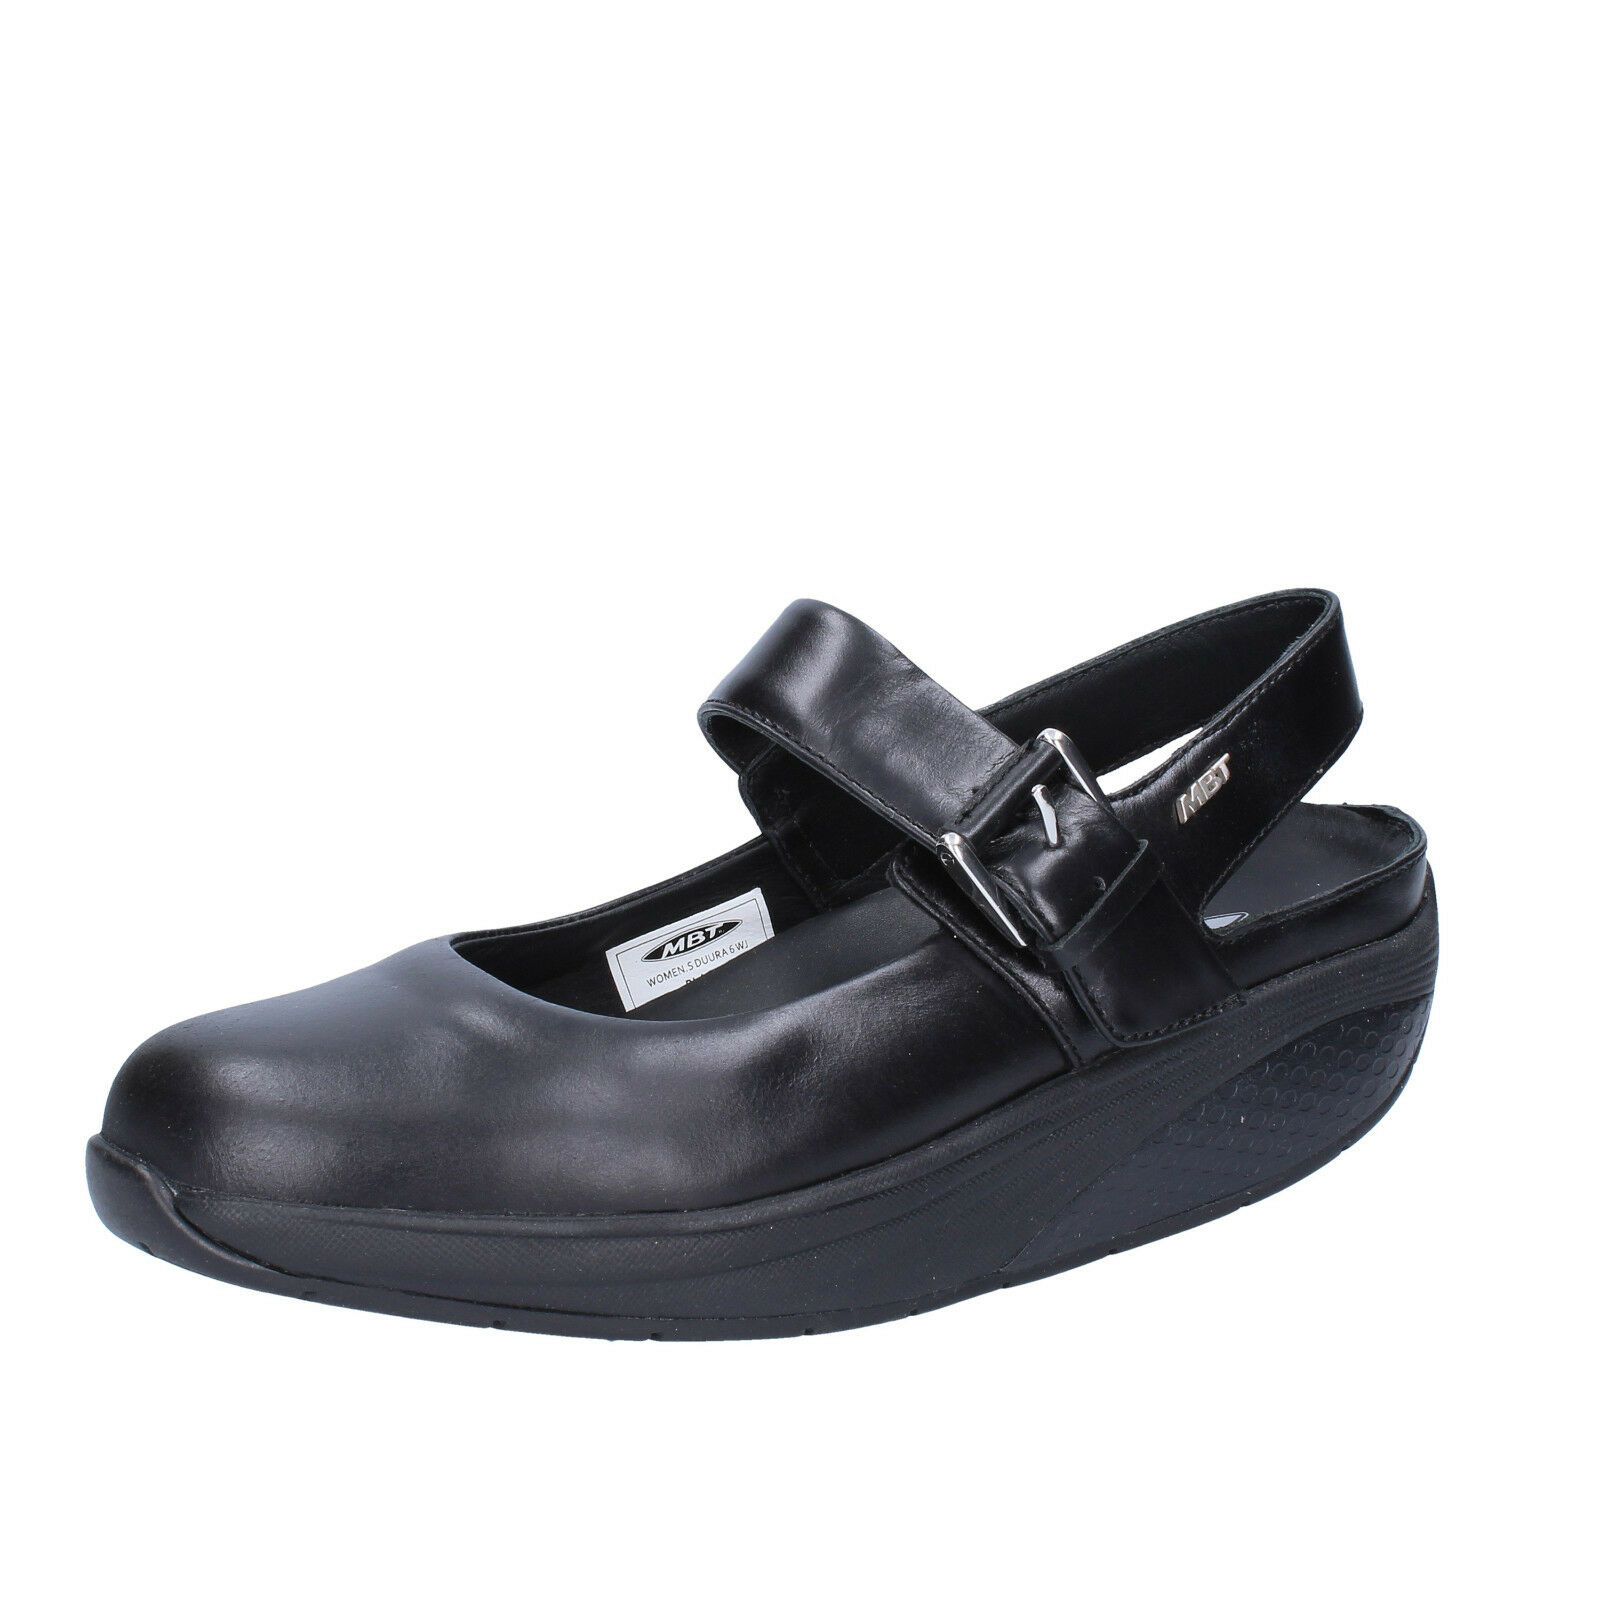 scarpe donna MBT 37 pelle ballerine nero pelle 37 AC375-B 3809d8